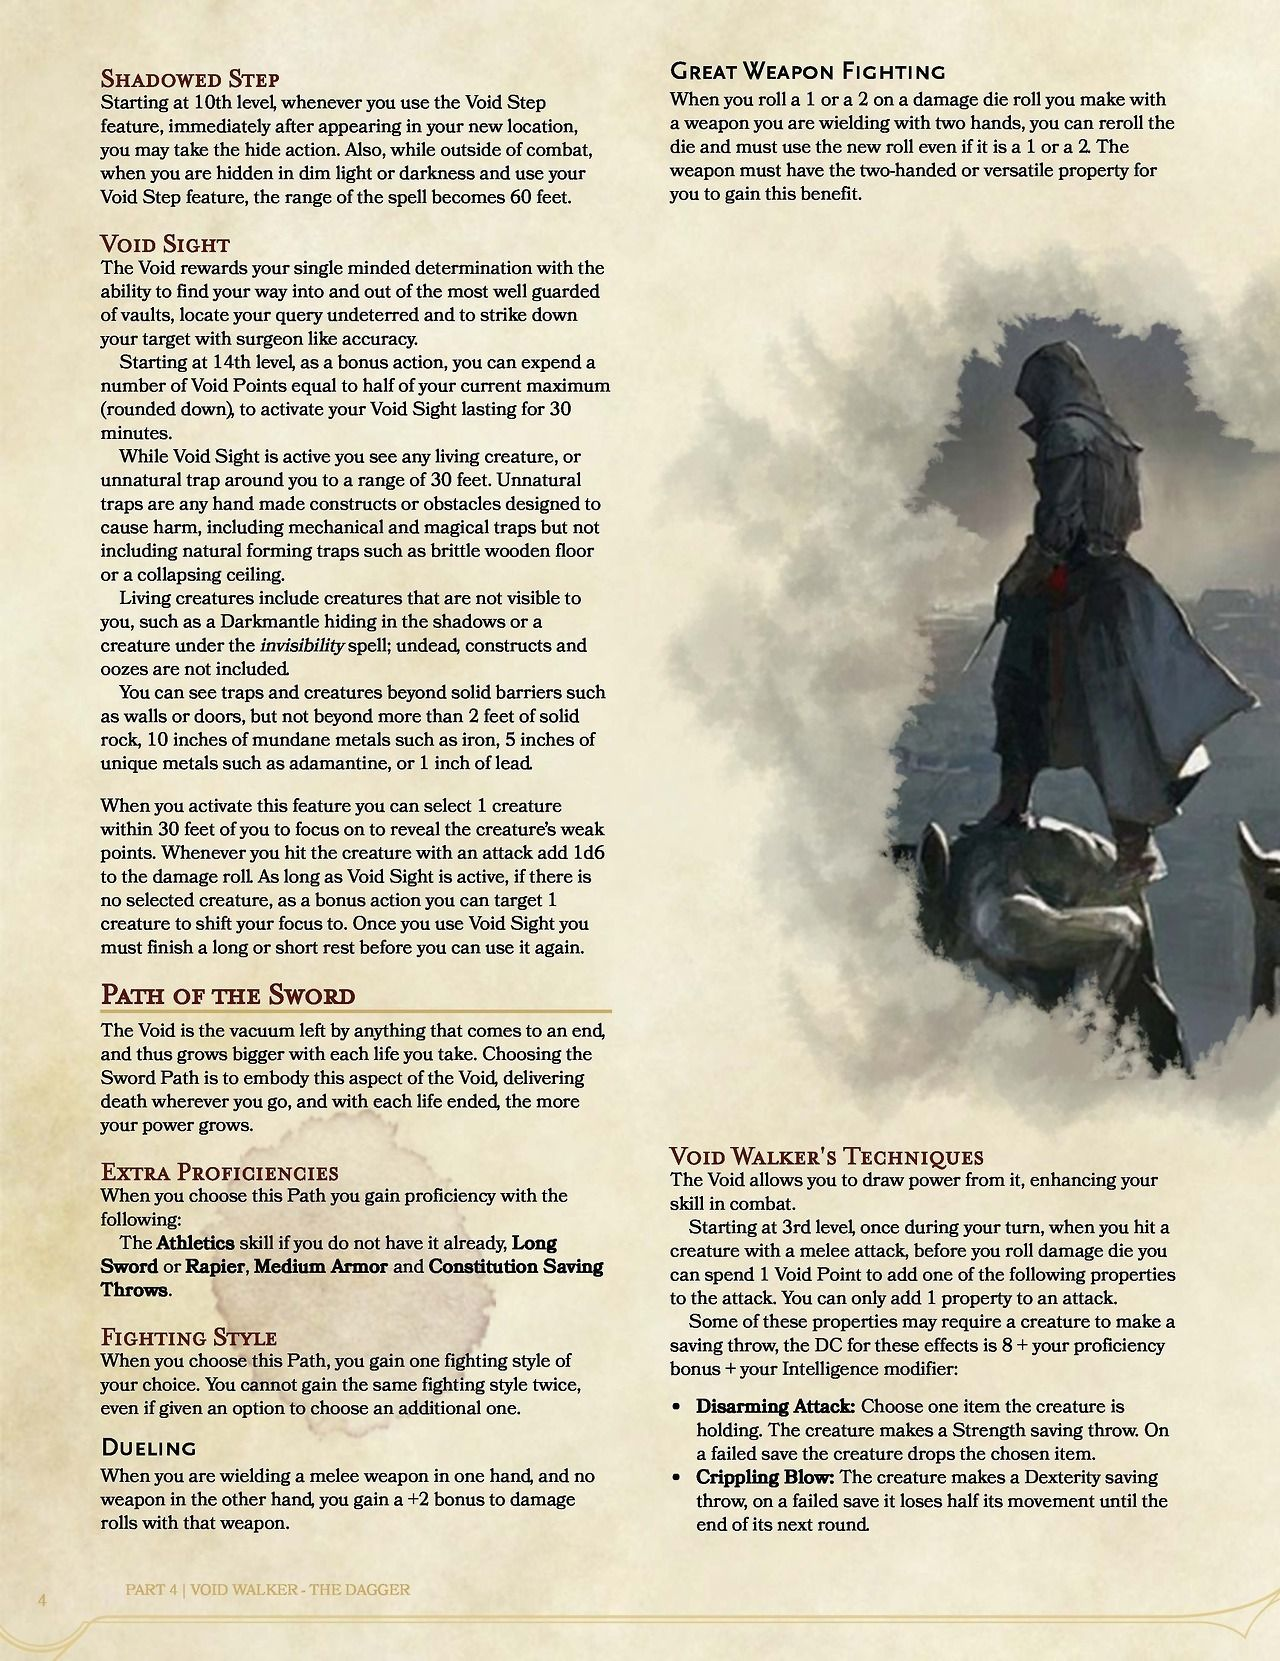 D&D n' stuff — A Dishonored-inspired homebrewed class I've